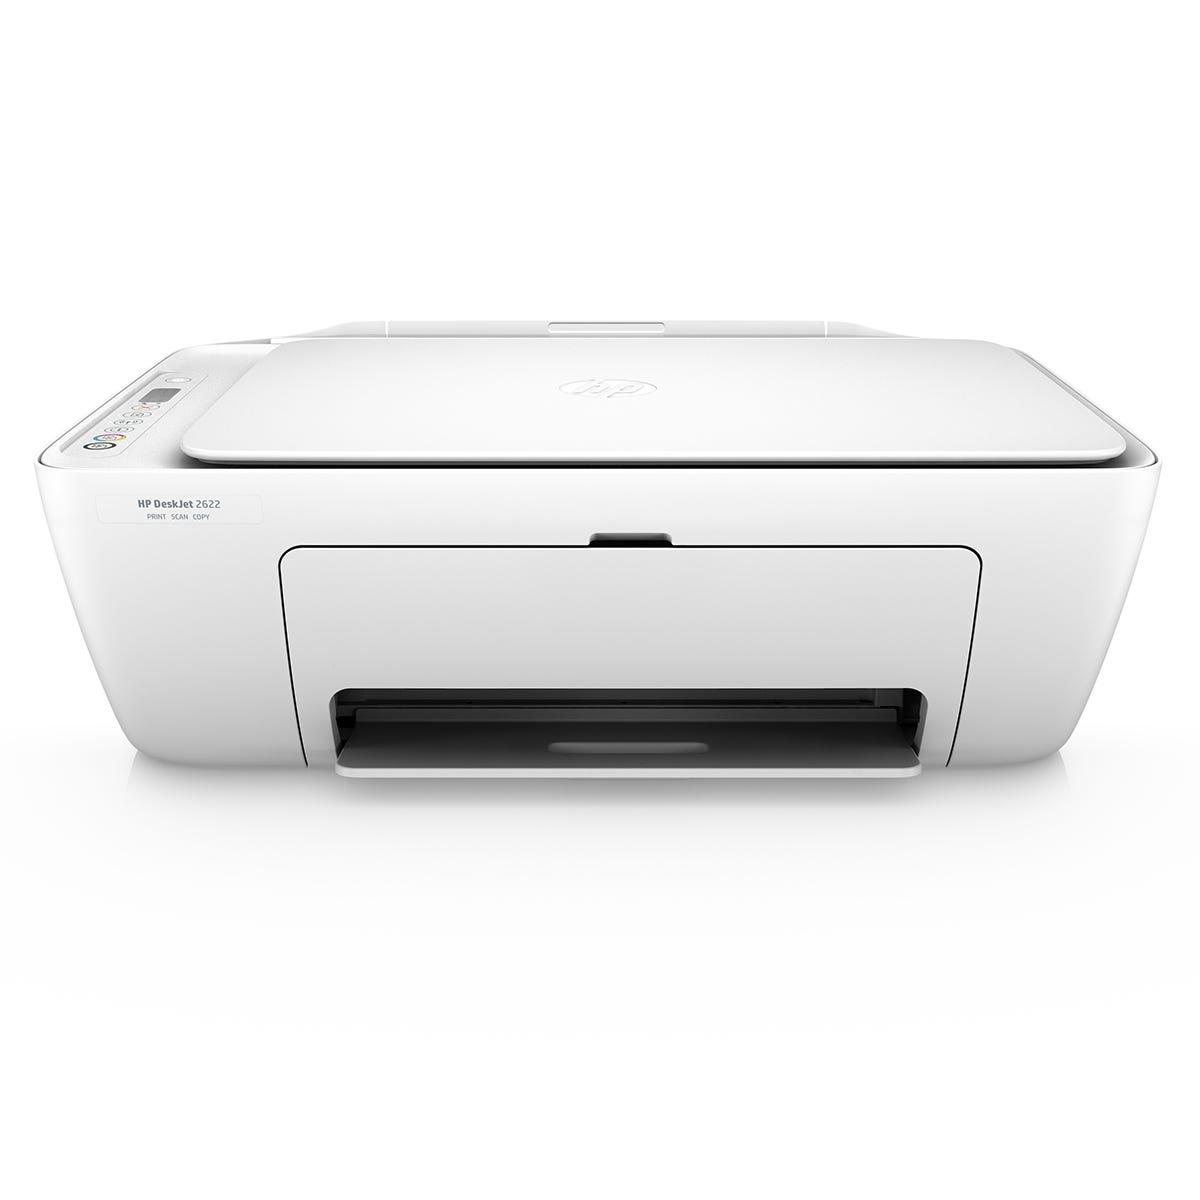 HP Deskjet 2622 Wireless Printer